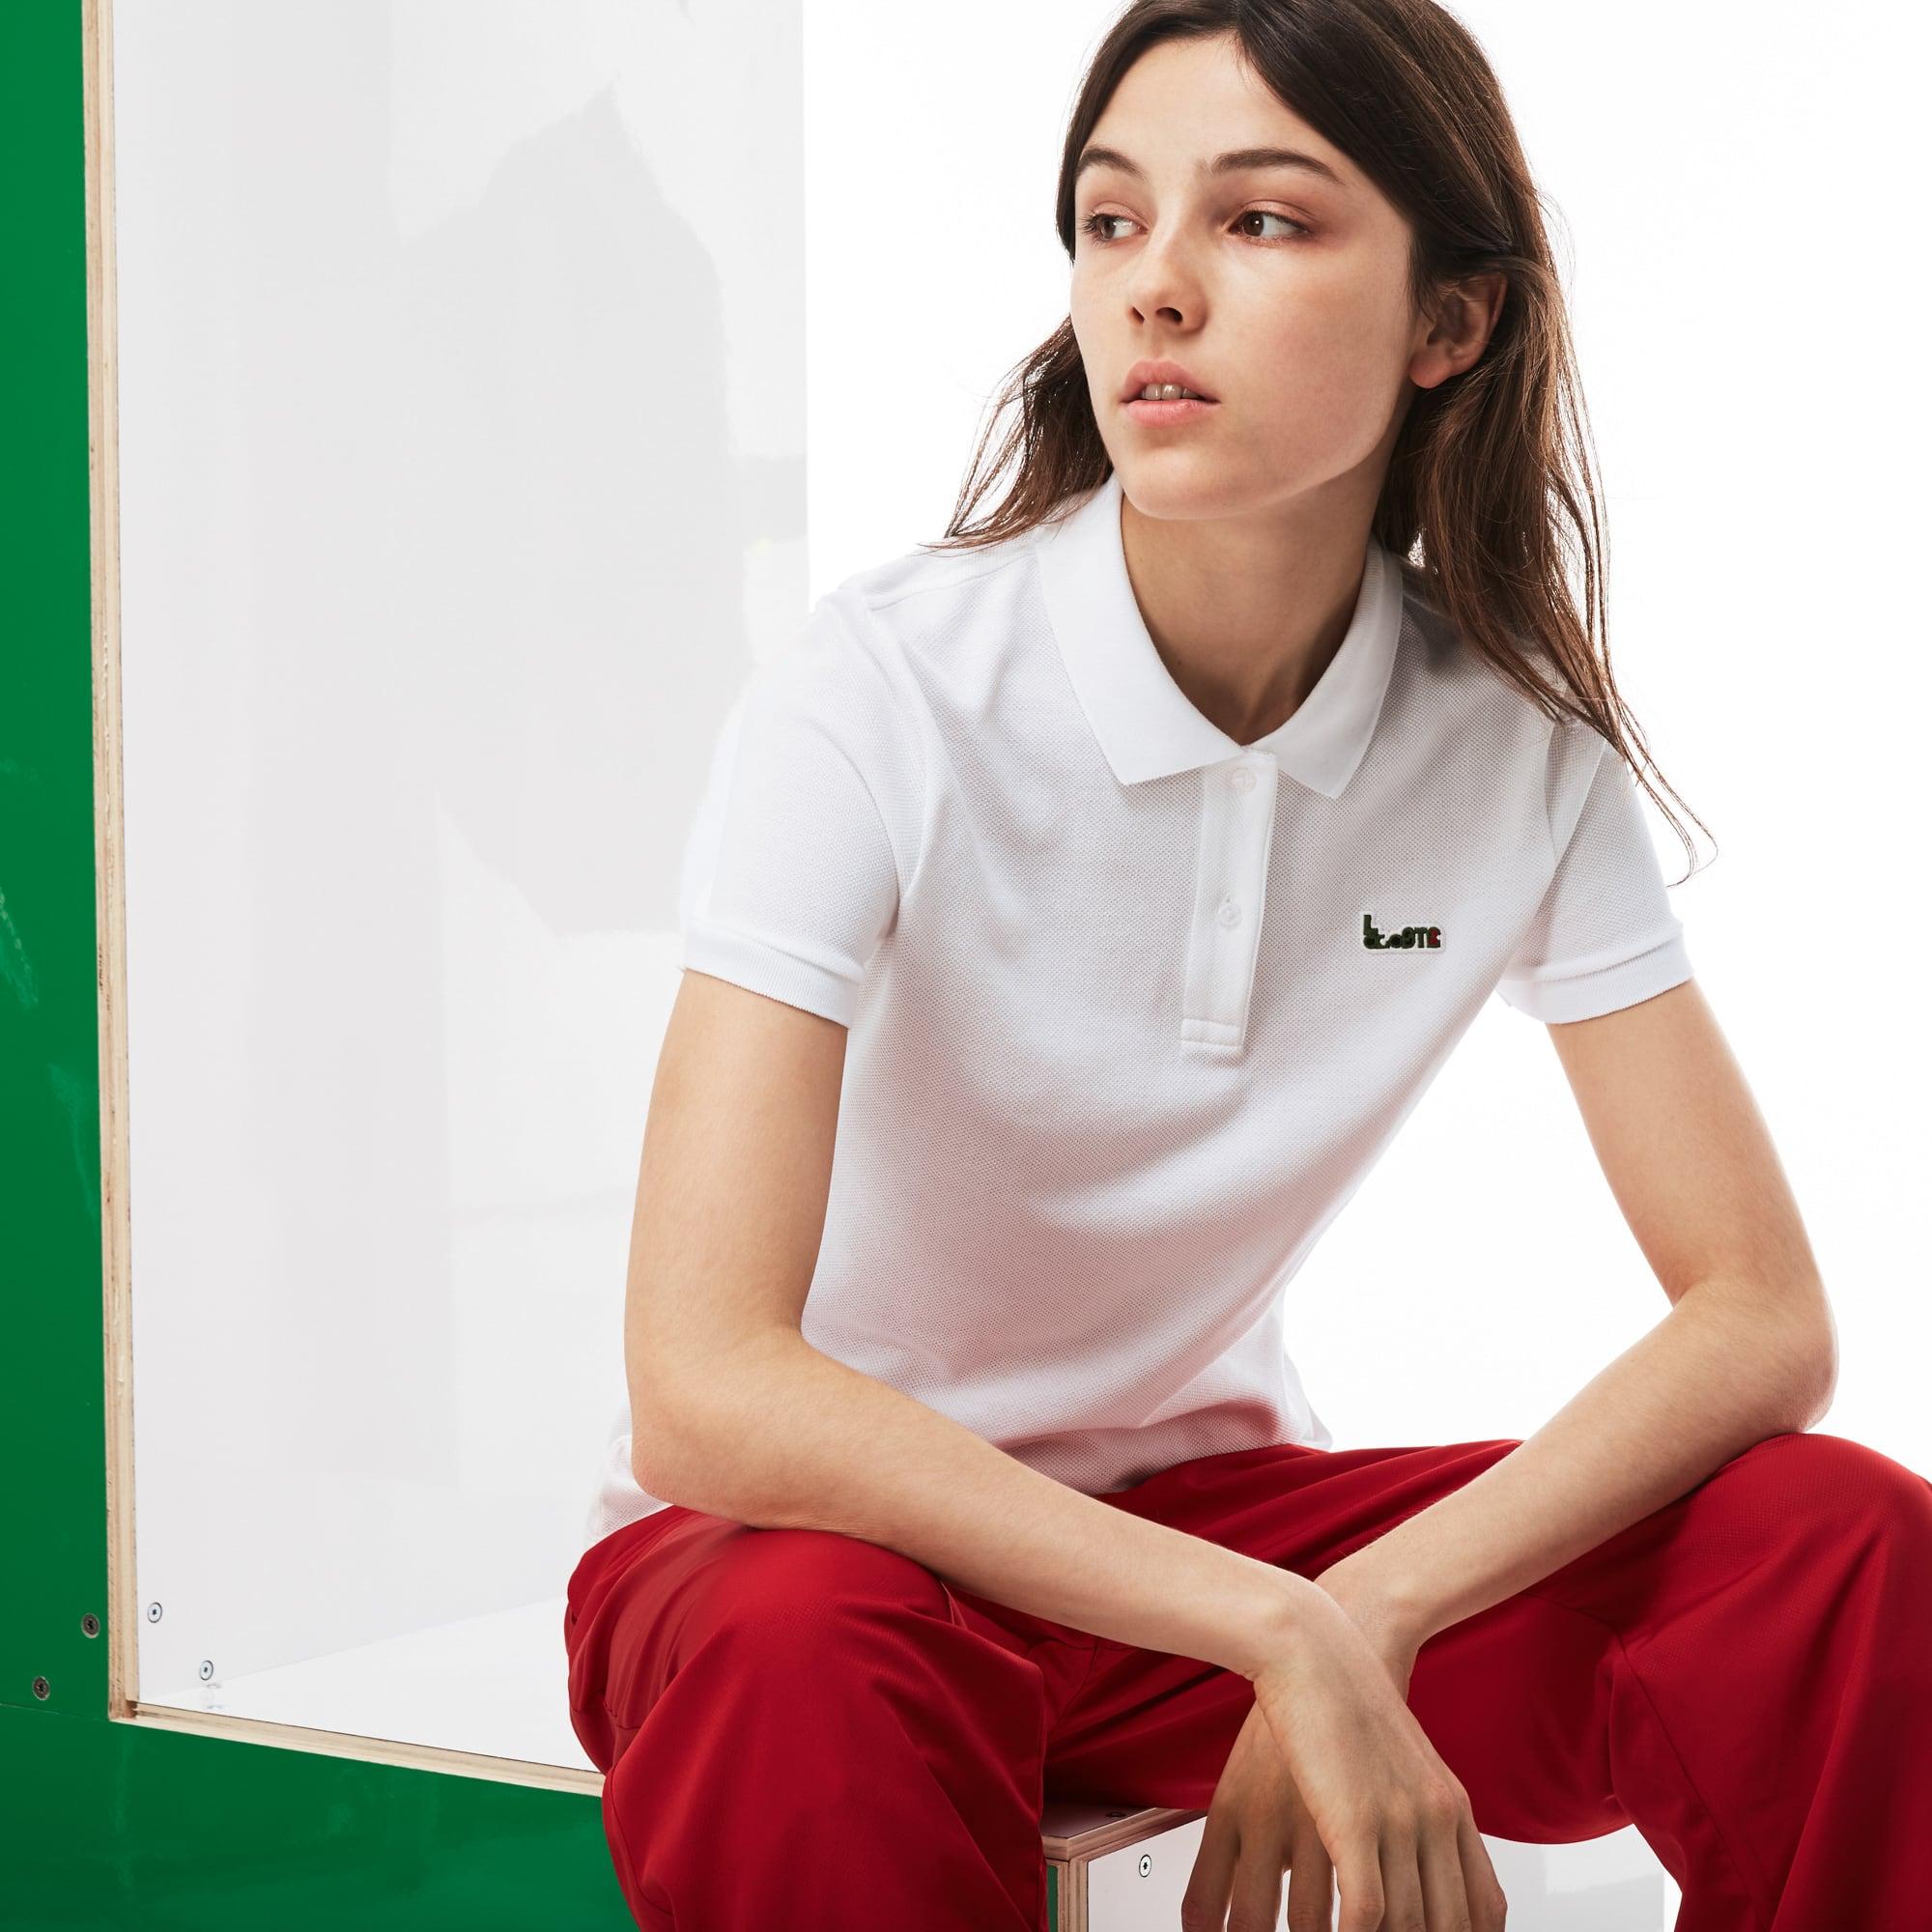 Slim Fit Damen-Poloshirt MM COLLAB aus dickem Baumwoll-Piqué